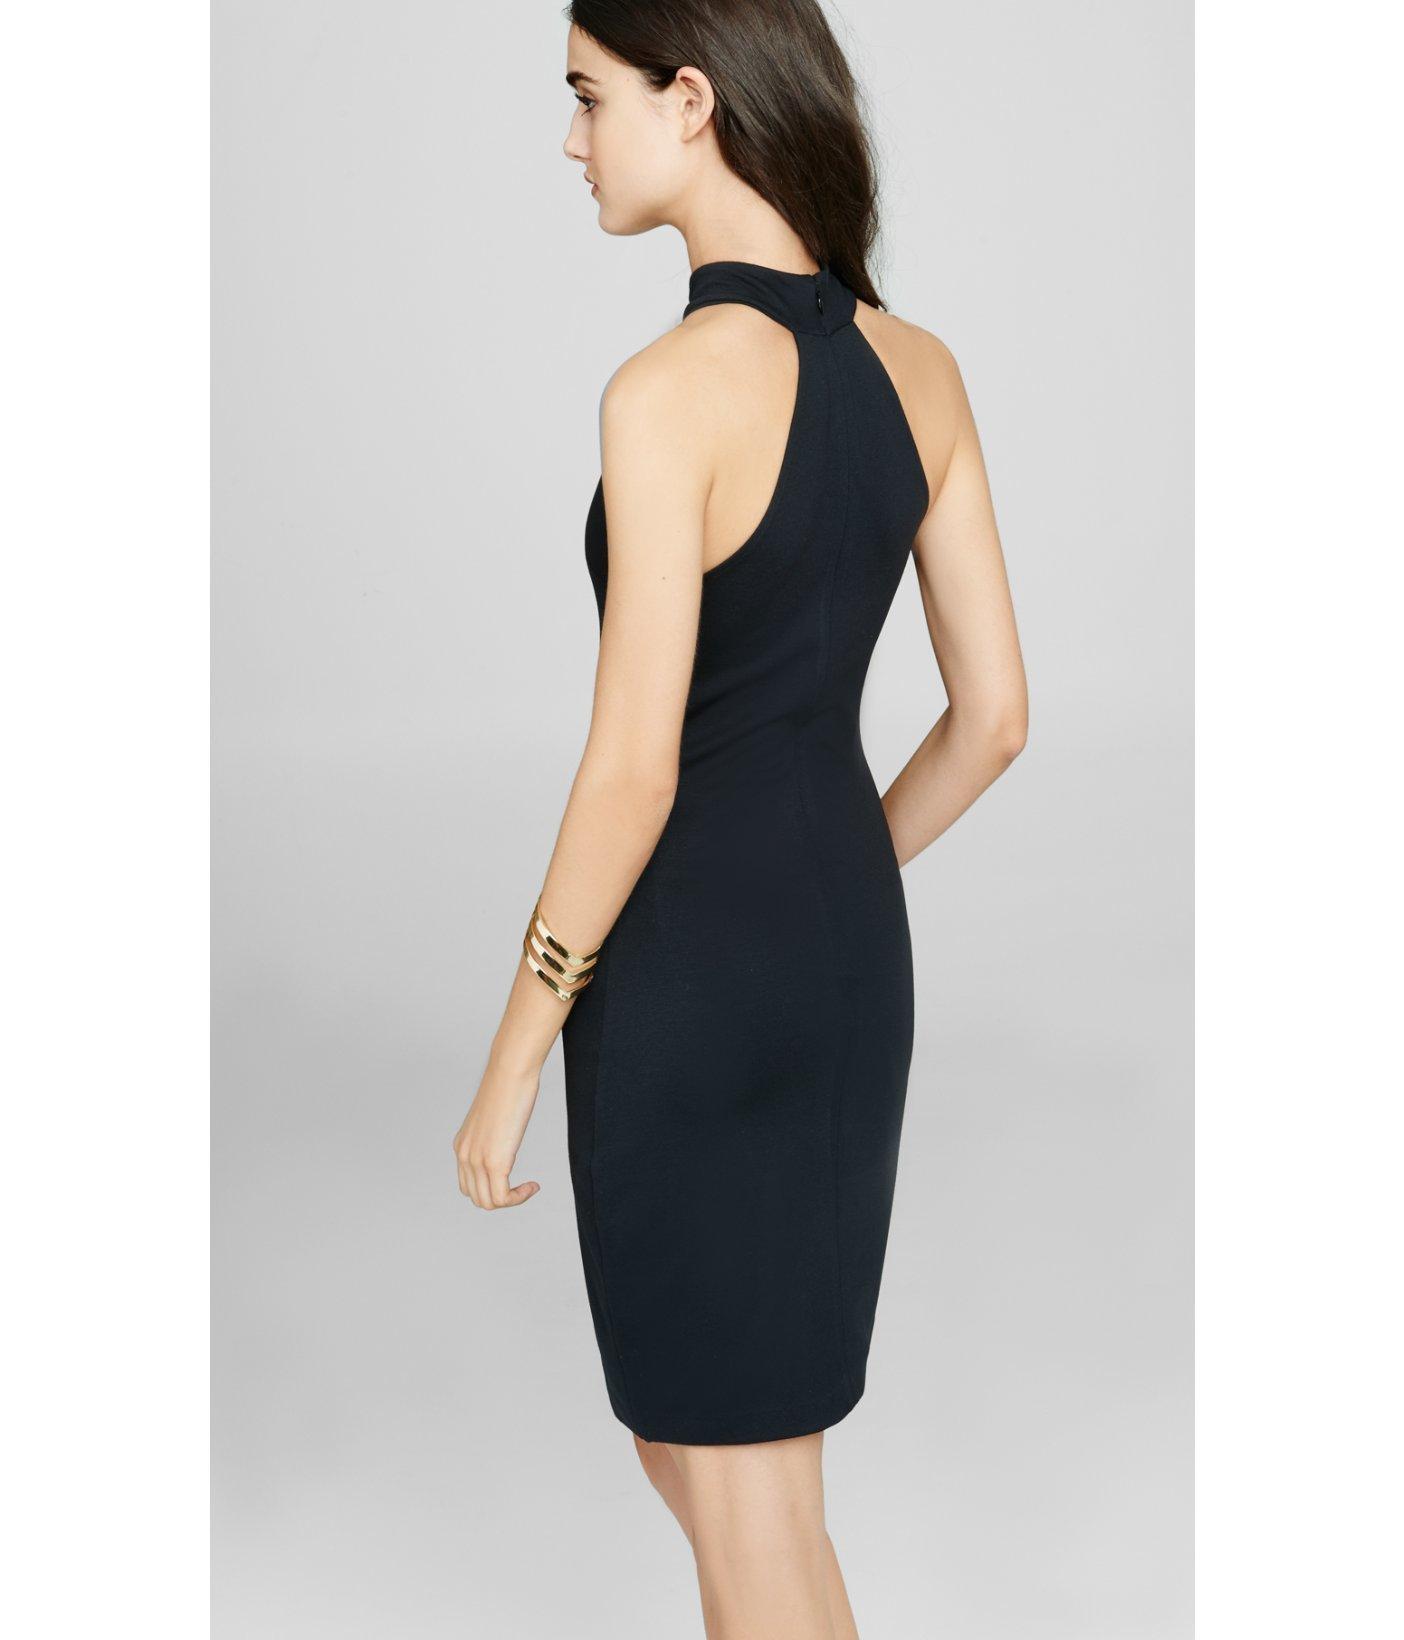 High Neck Halter Dresses